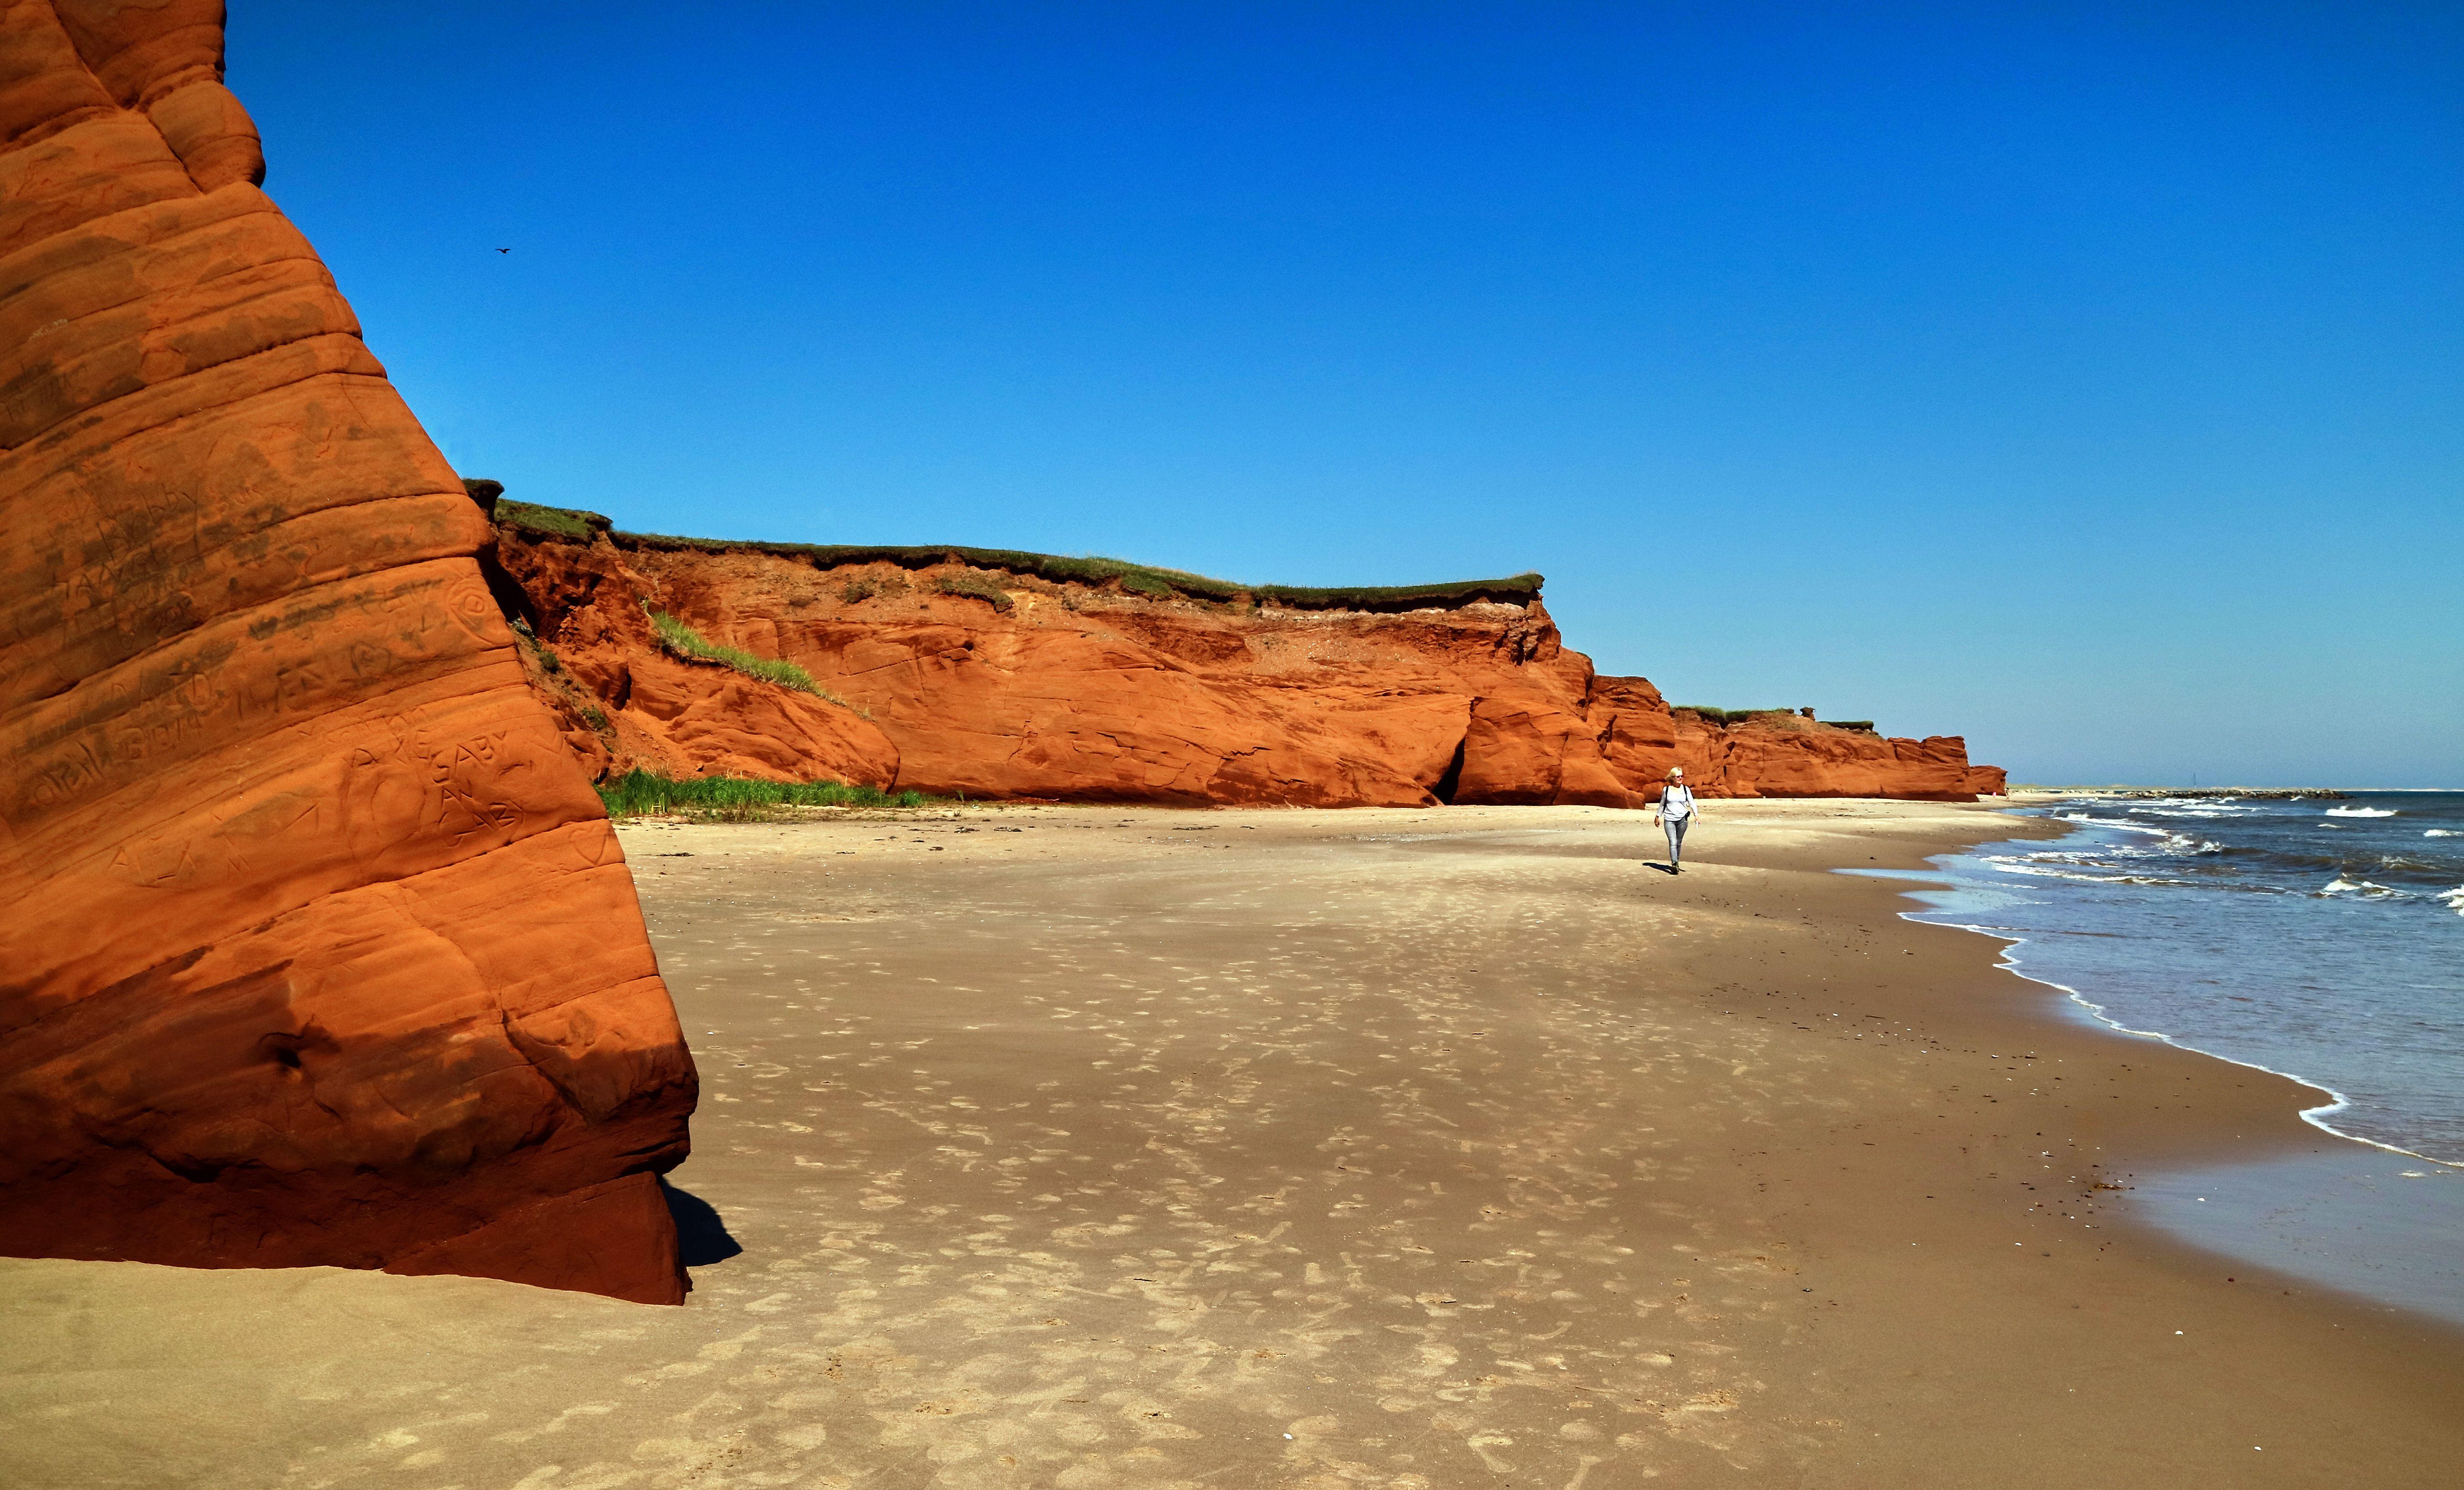 Red sandstone cliffs in the Magdalen Islands